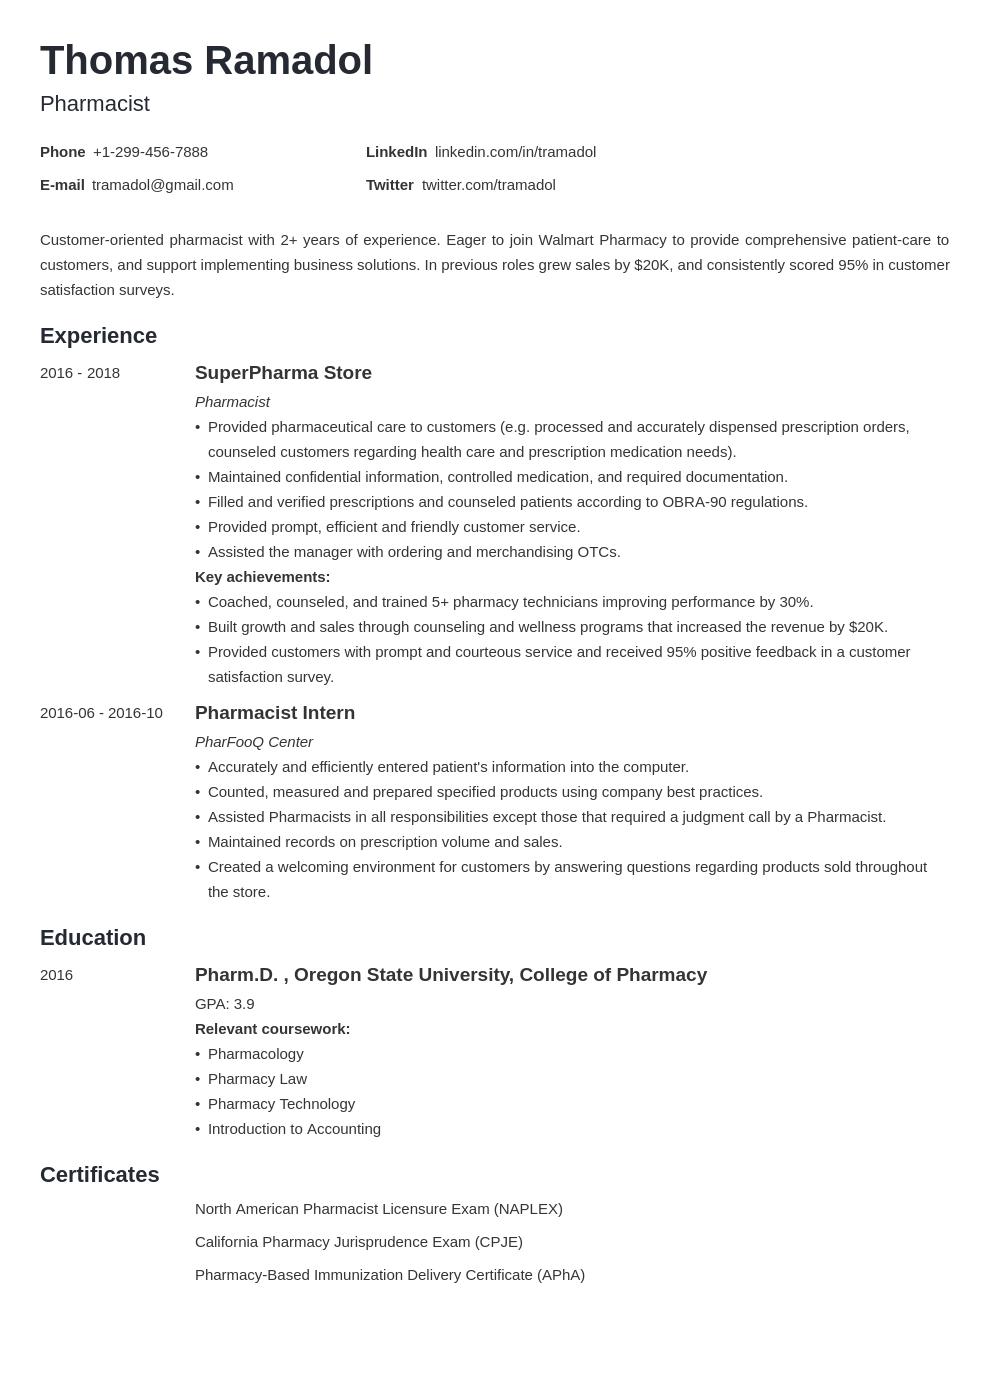 pharmacist template minimo uk